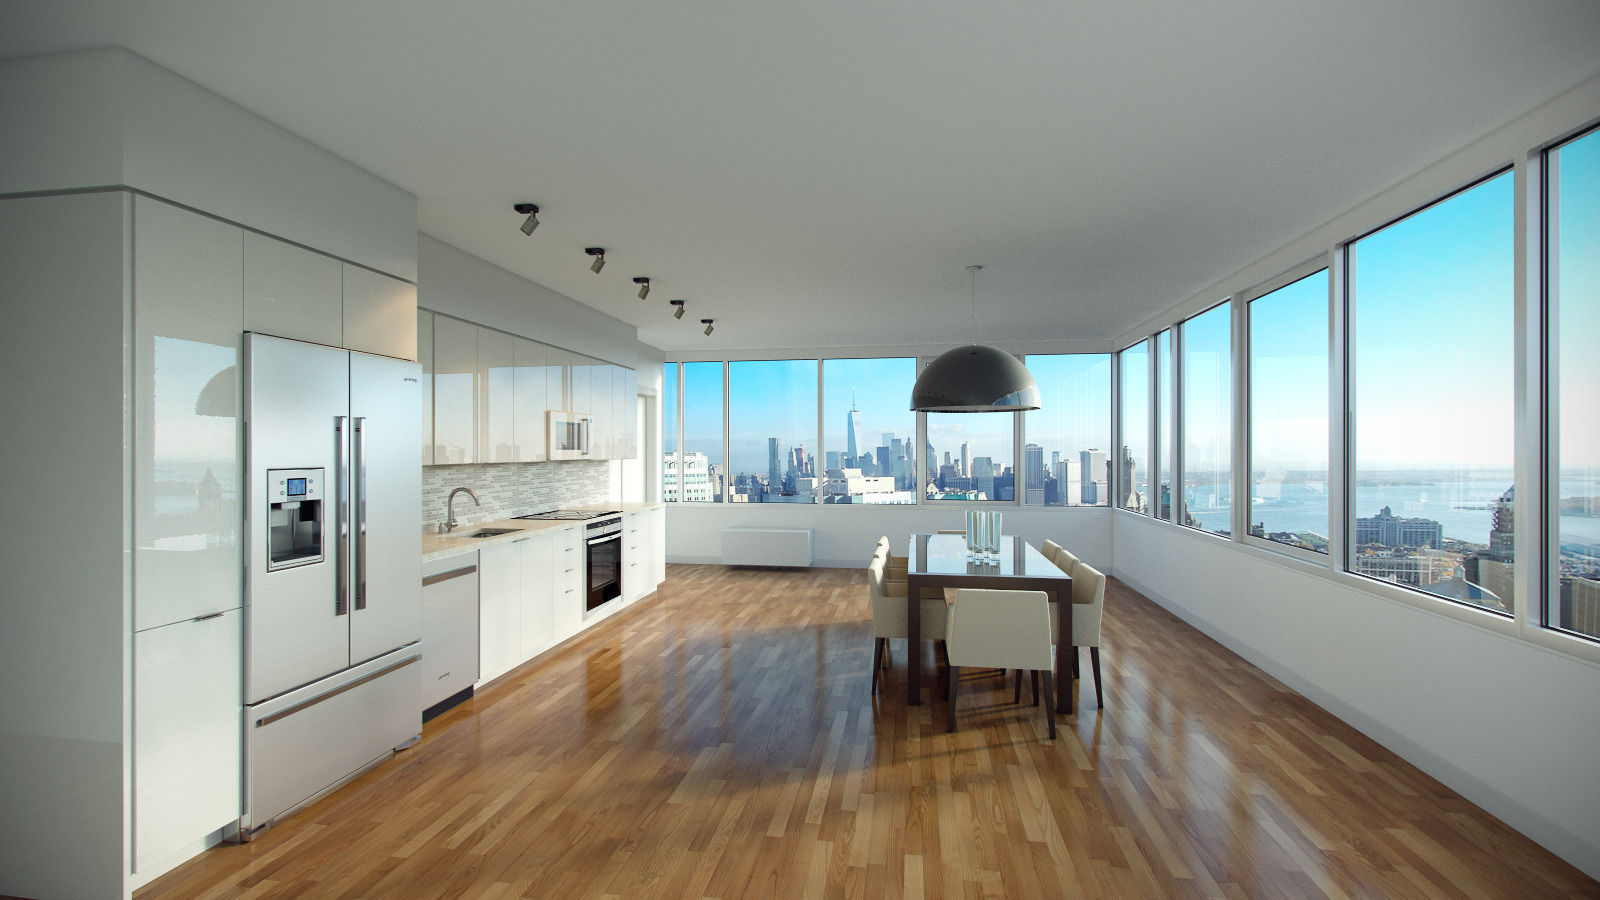 Photorealistic Kitchen